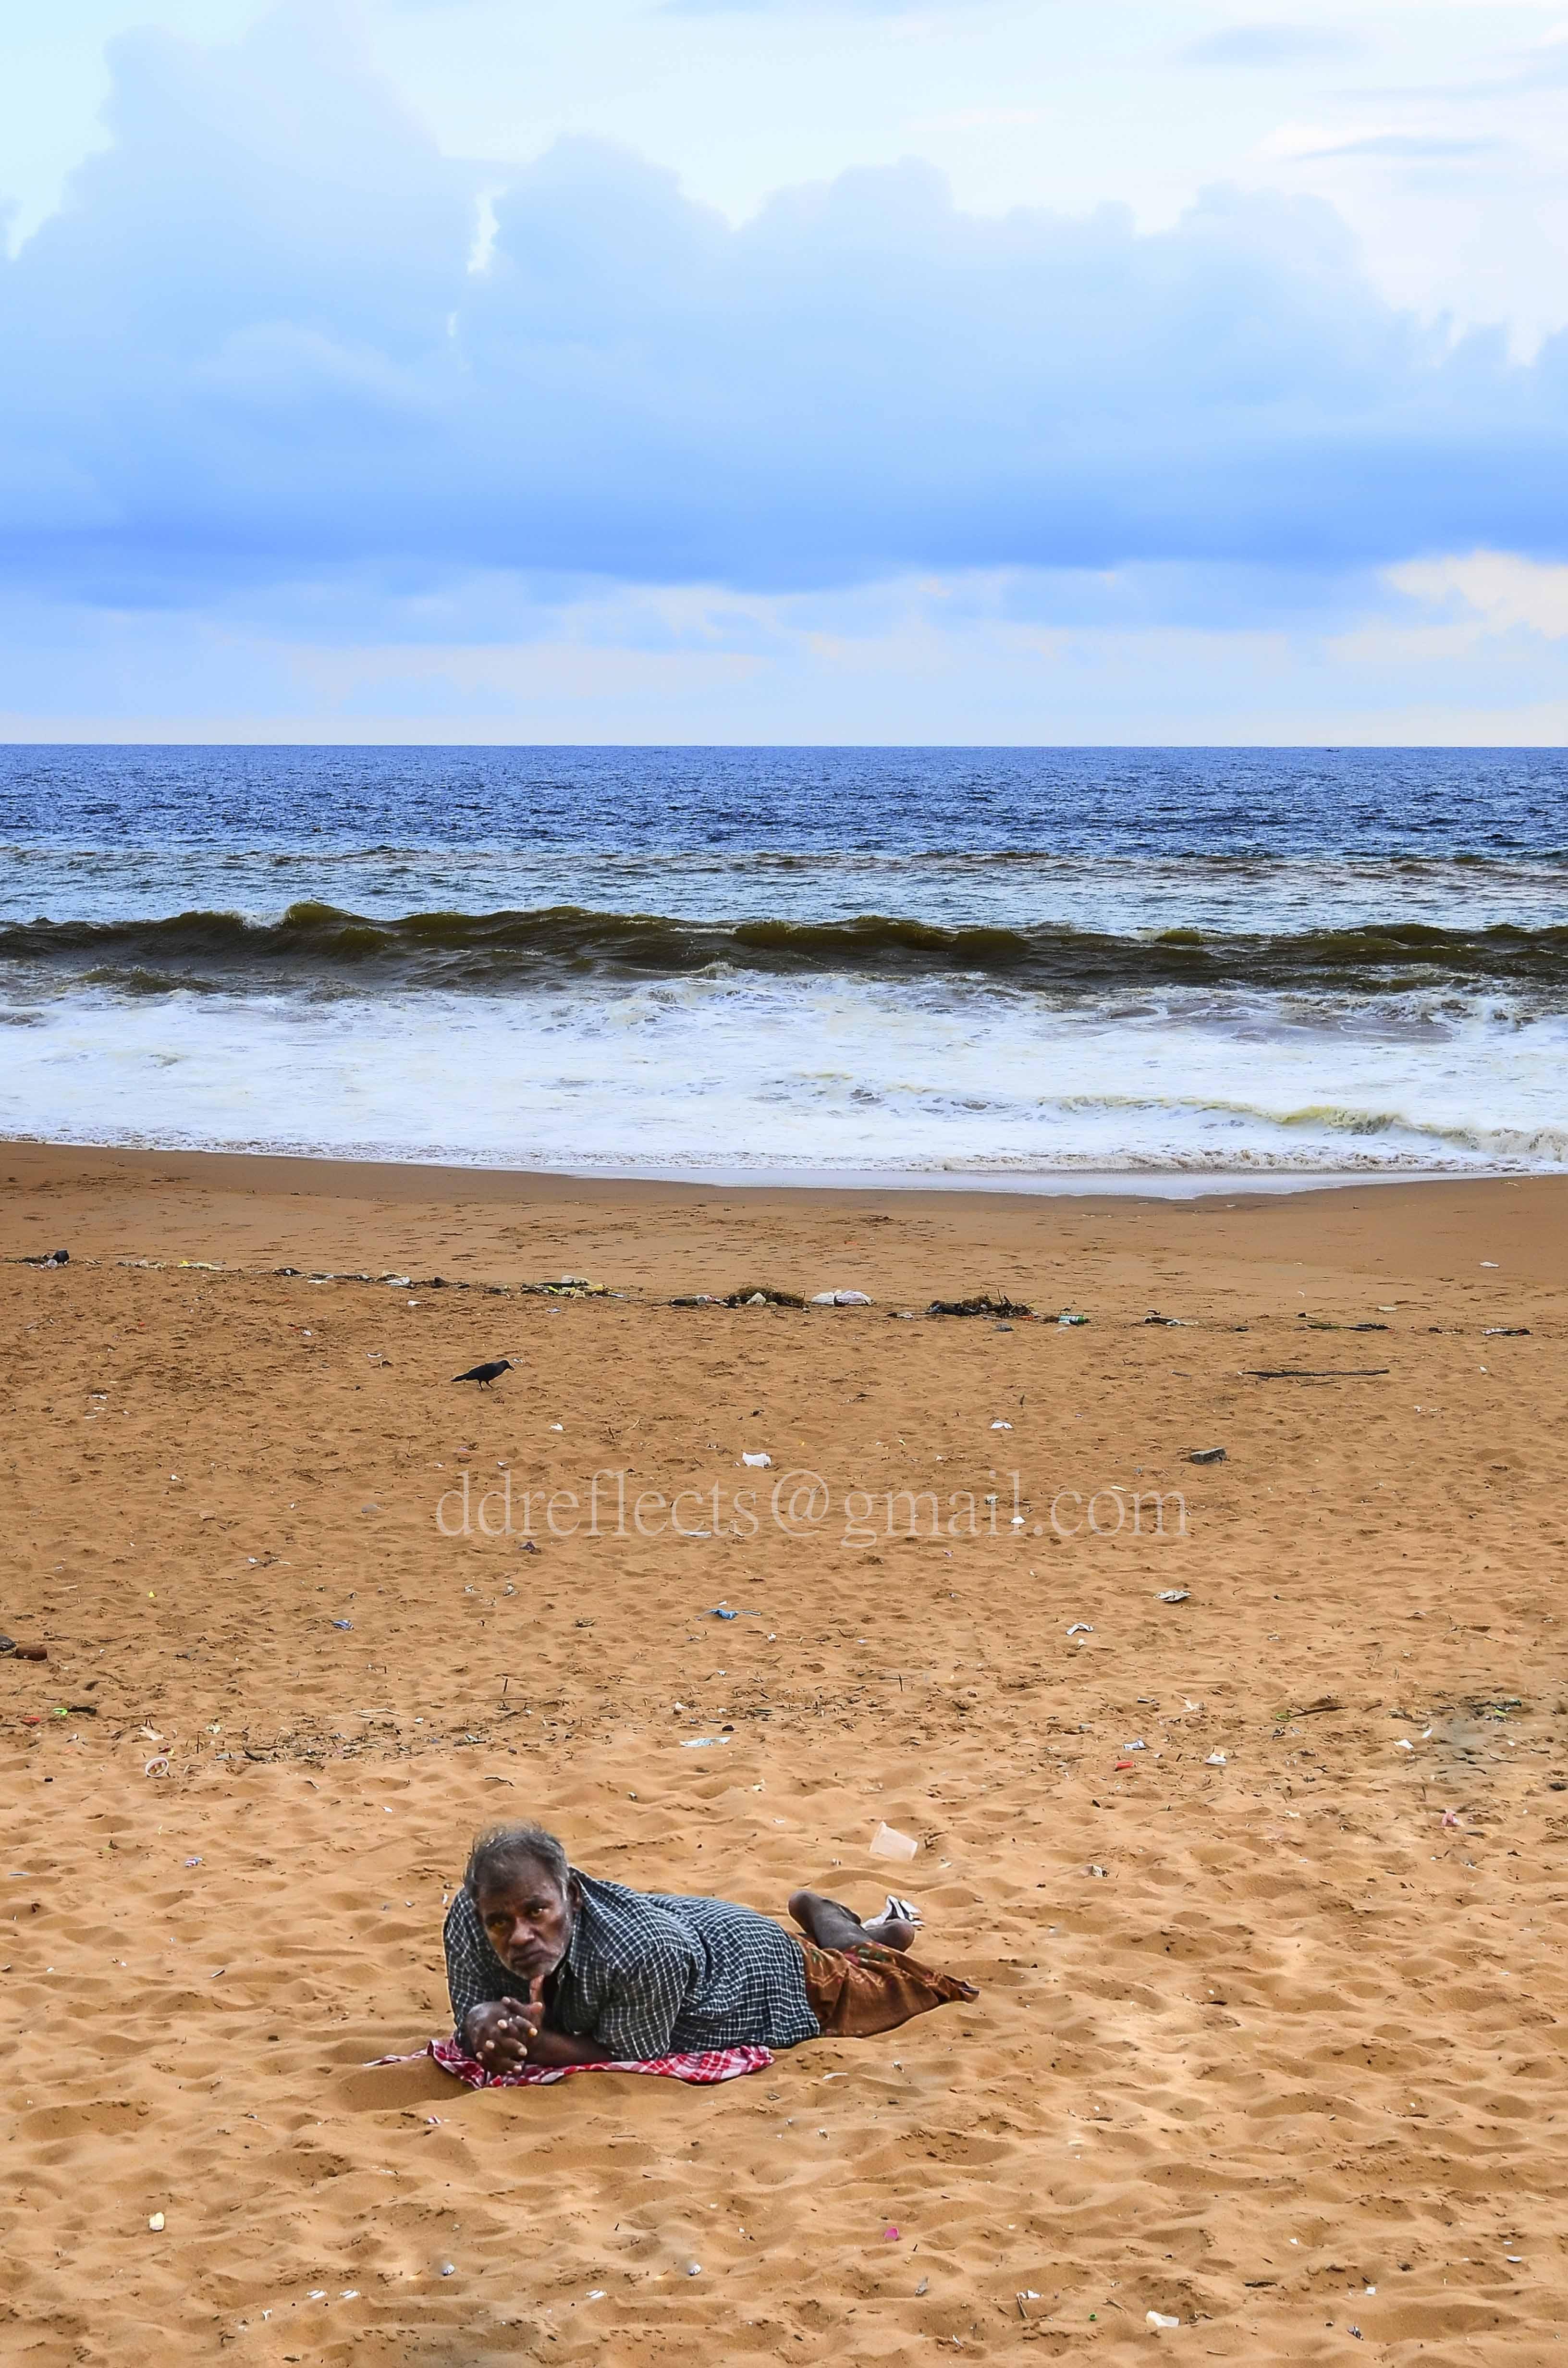 Alone man on the beach photo